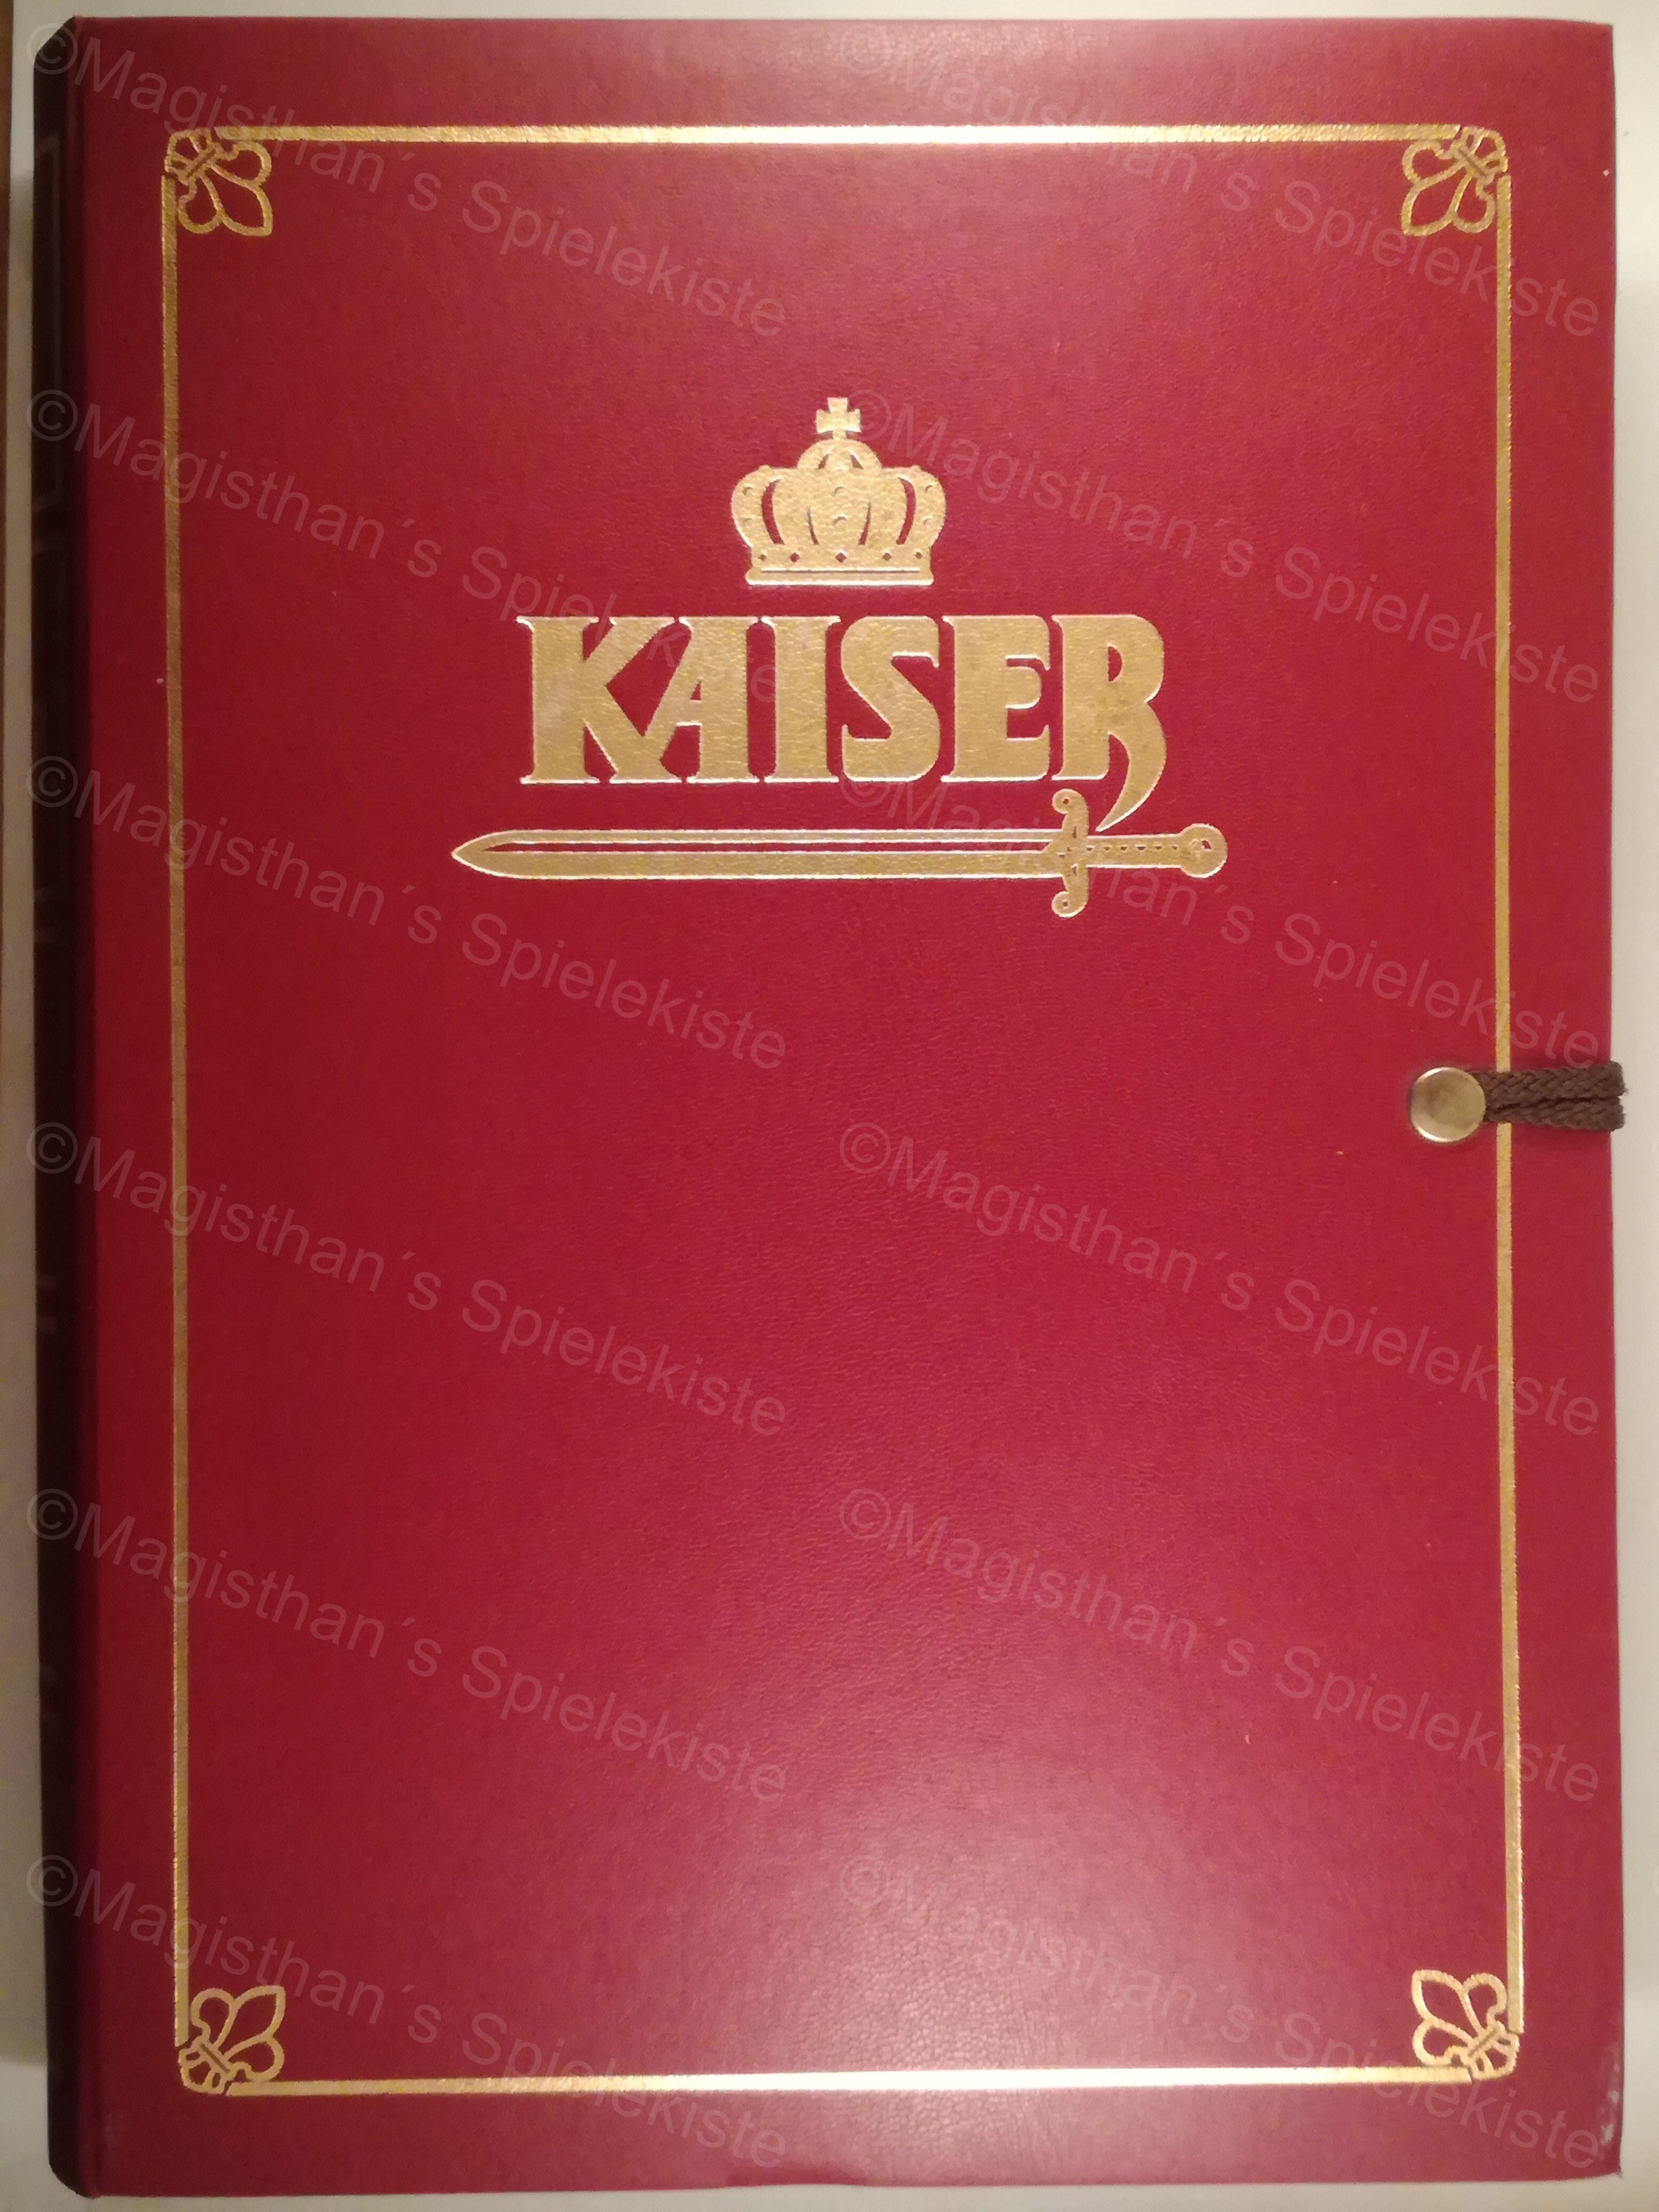 KaiserAmiga1a.jpg